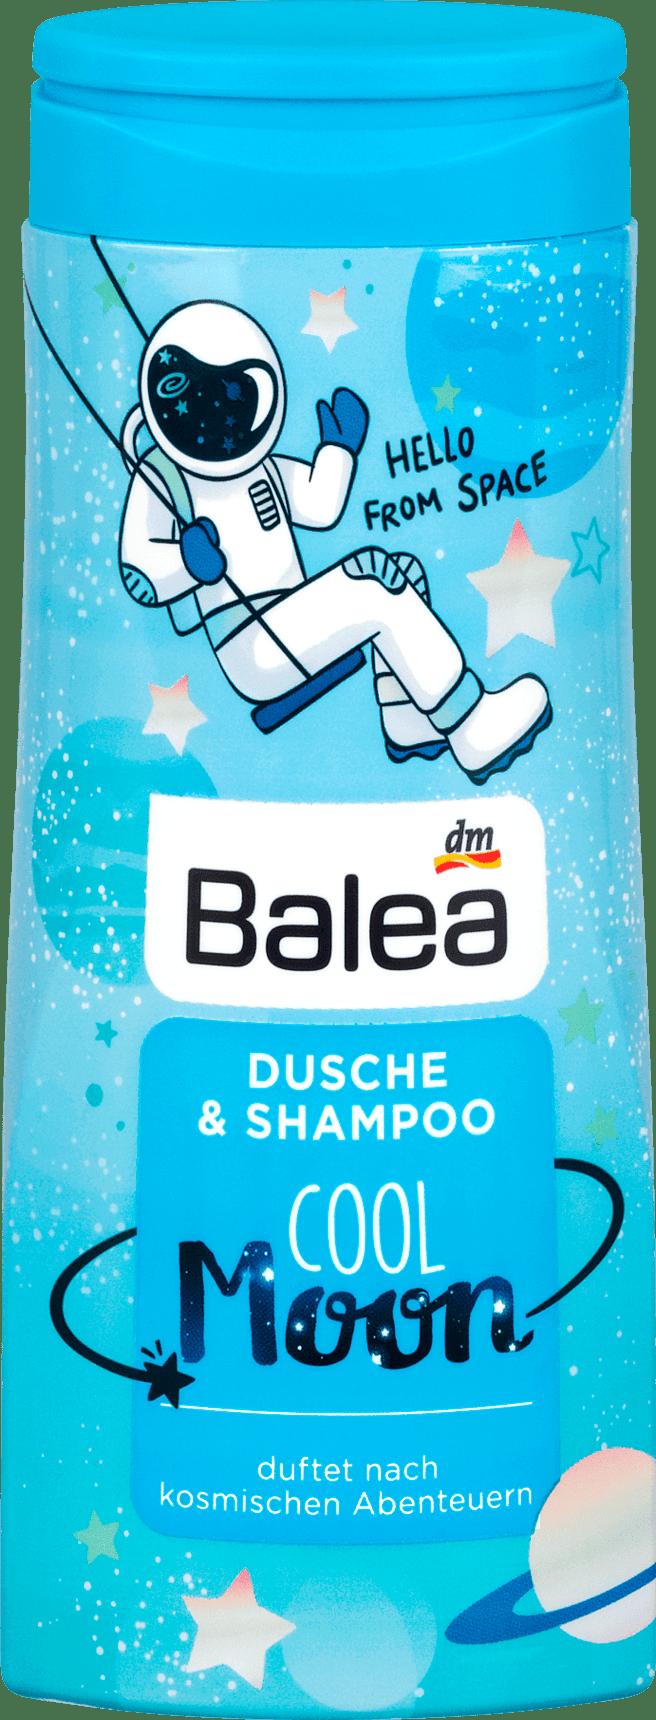 Balea Douche & Shampooing Cool Moon, 300 ml